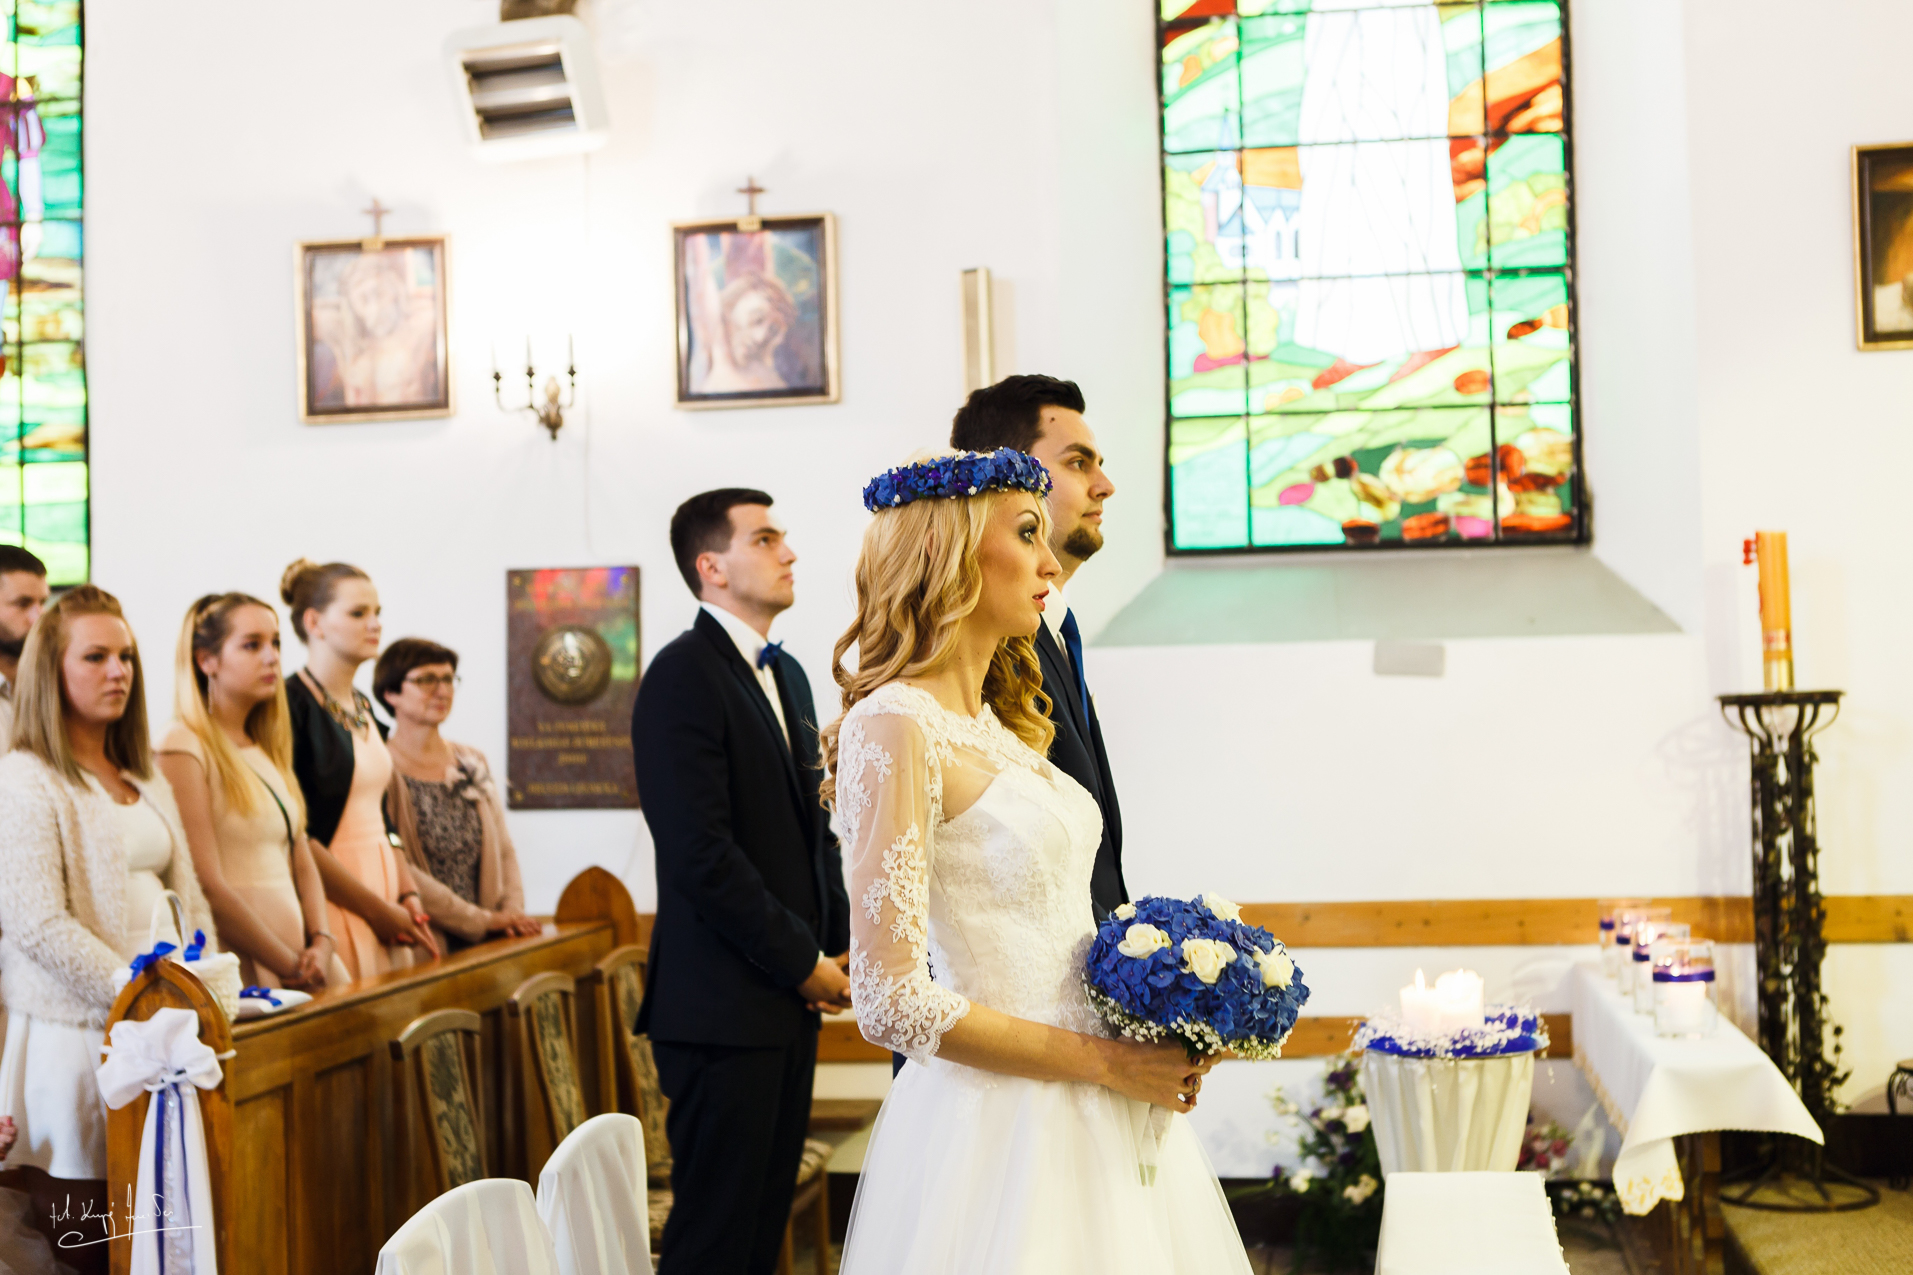 Ślub wesele szklarska poręba 21 Marta & Sławek